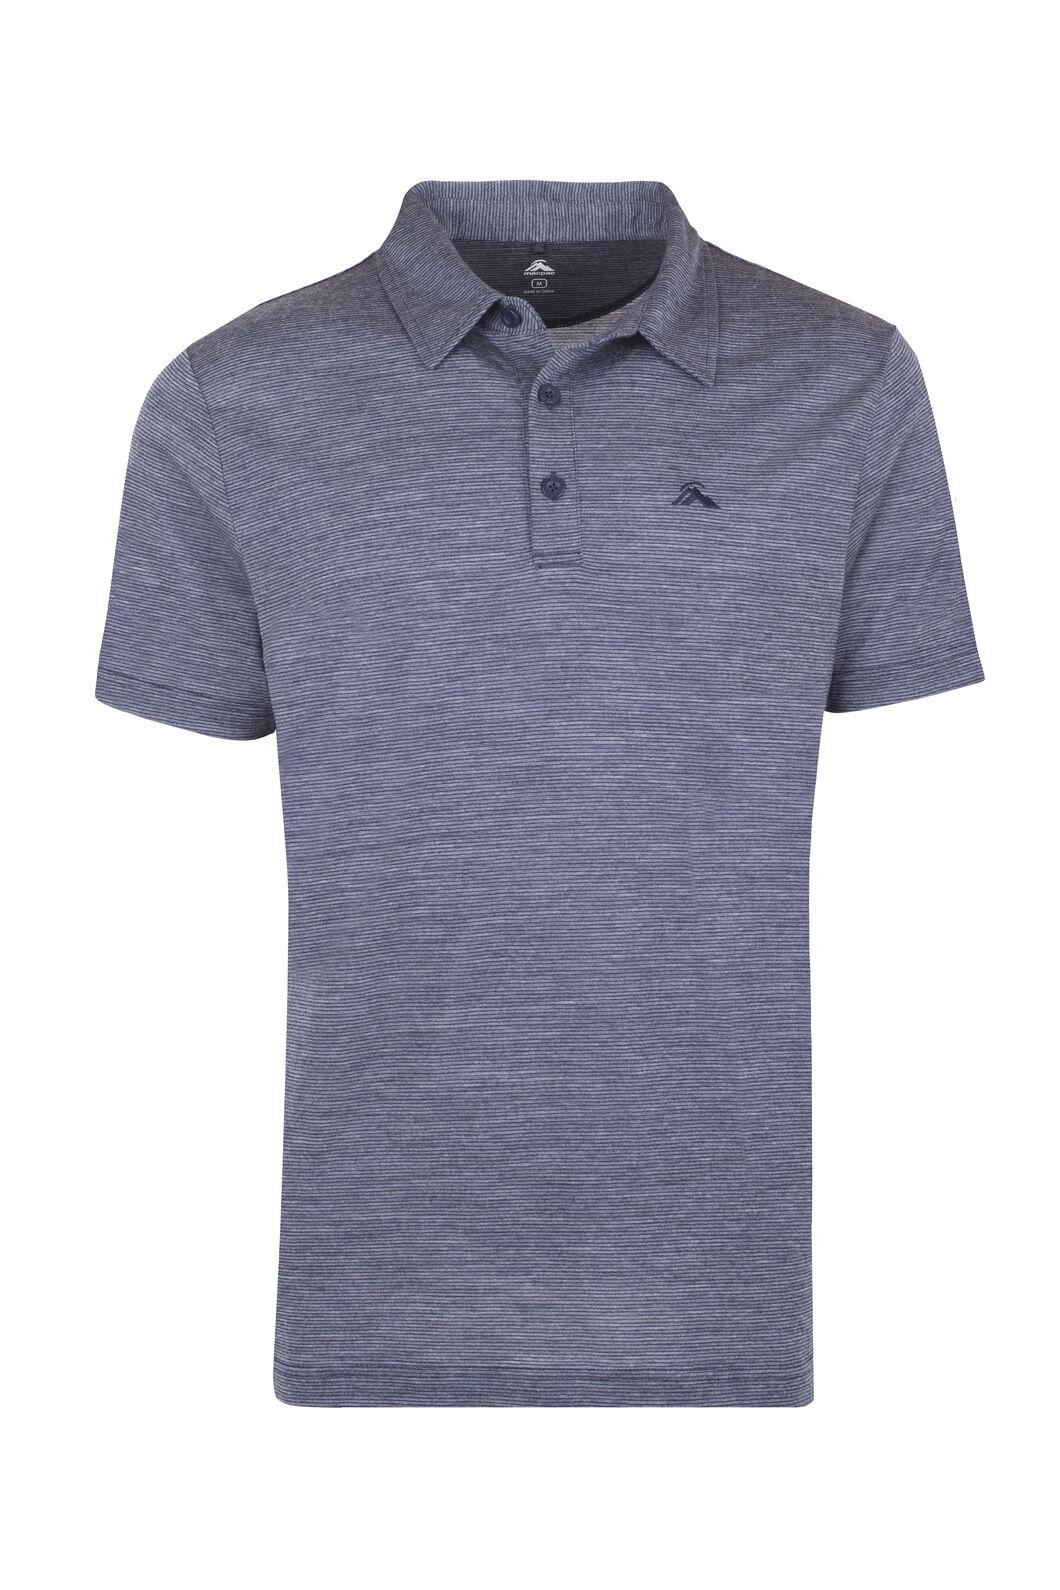 Macpac Merino Blend Short Sleeve Polo - Men's, Black Iris Stripe, hi-res